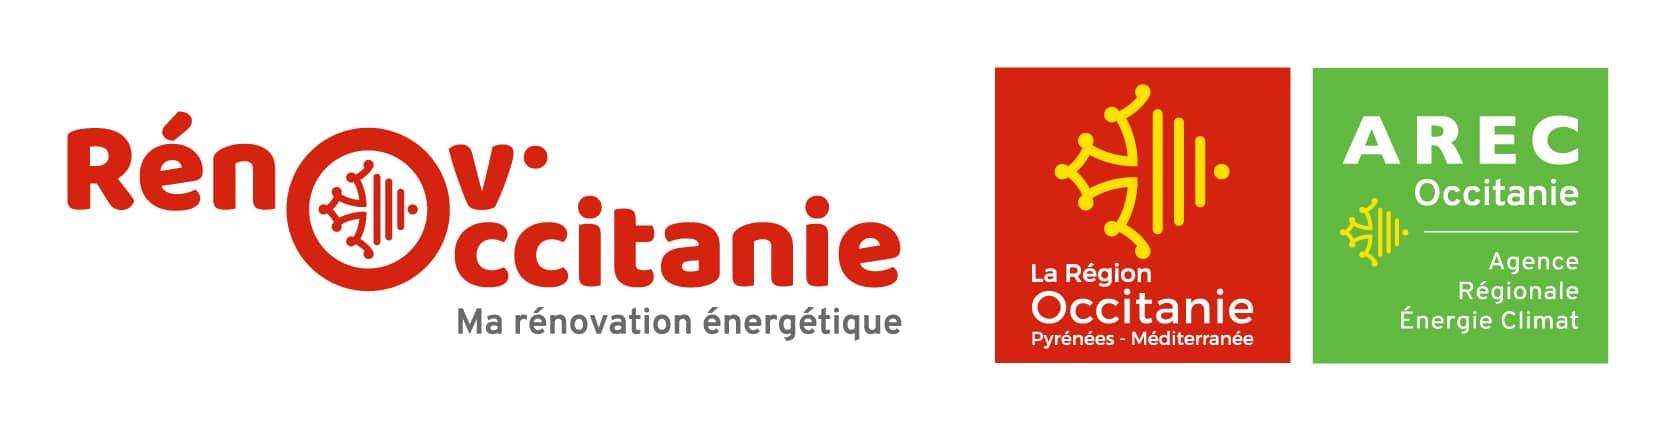 Logos Renov'Occitanie